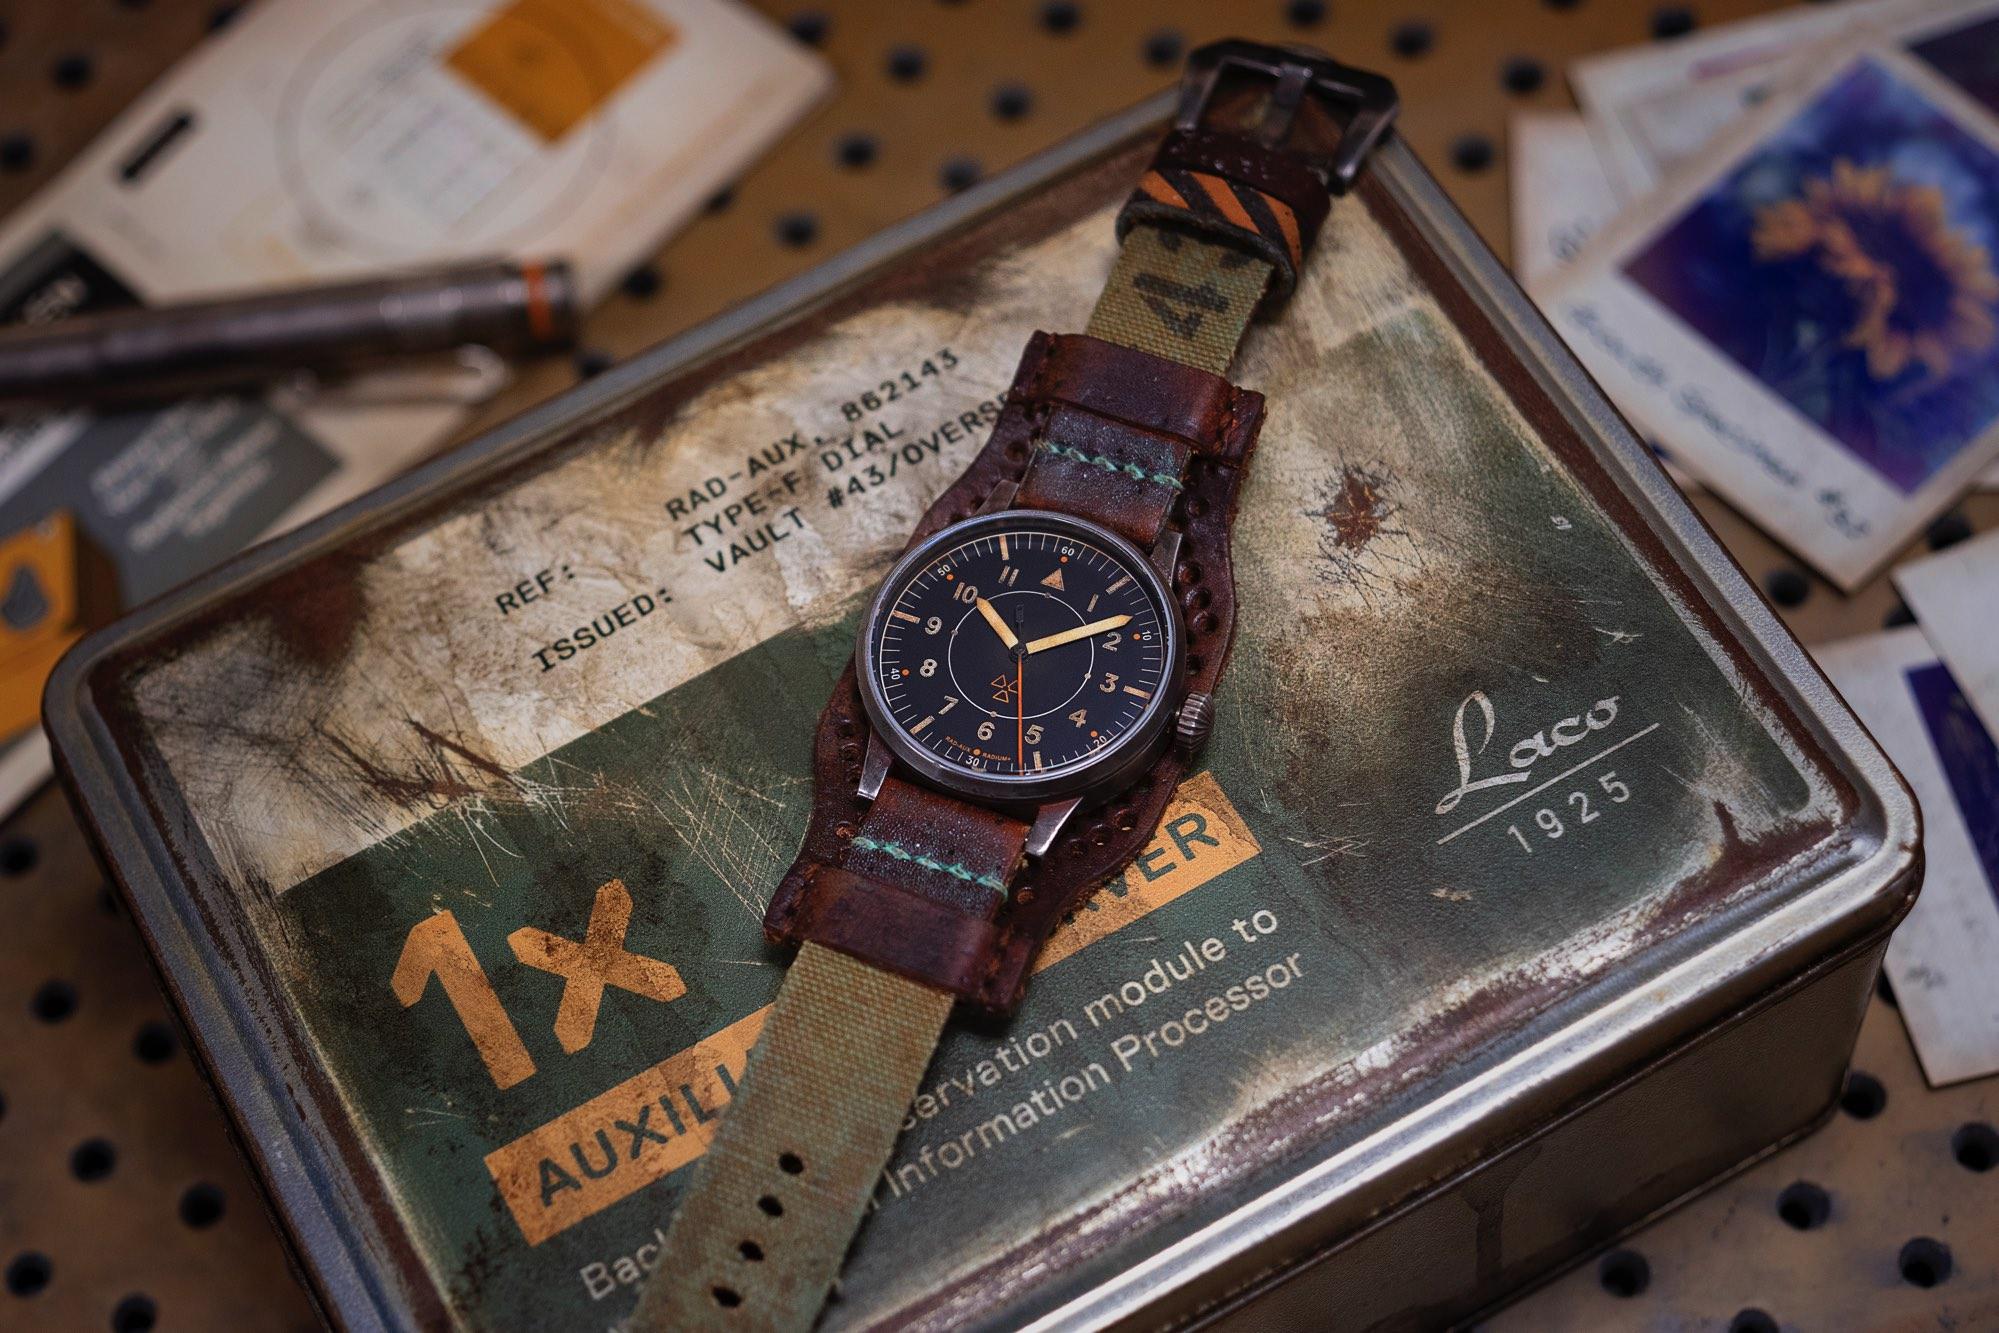 Laco RAD AUX Auxiliary Observer Weathered Tin Box Fallout